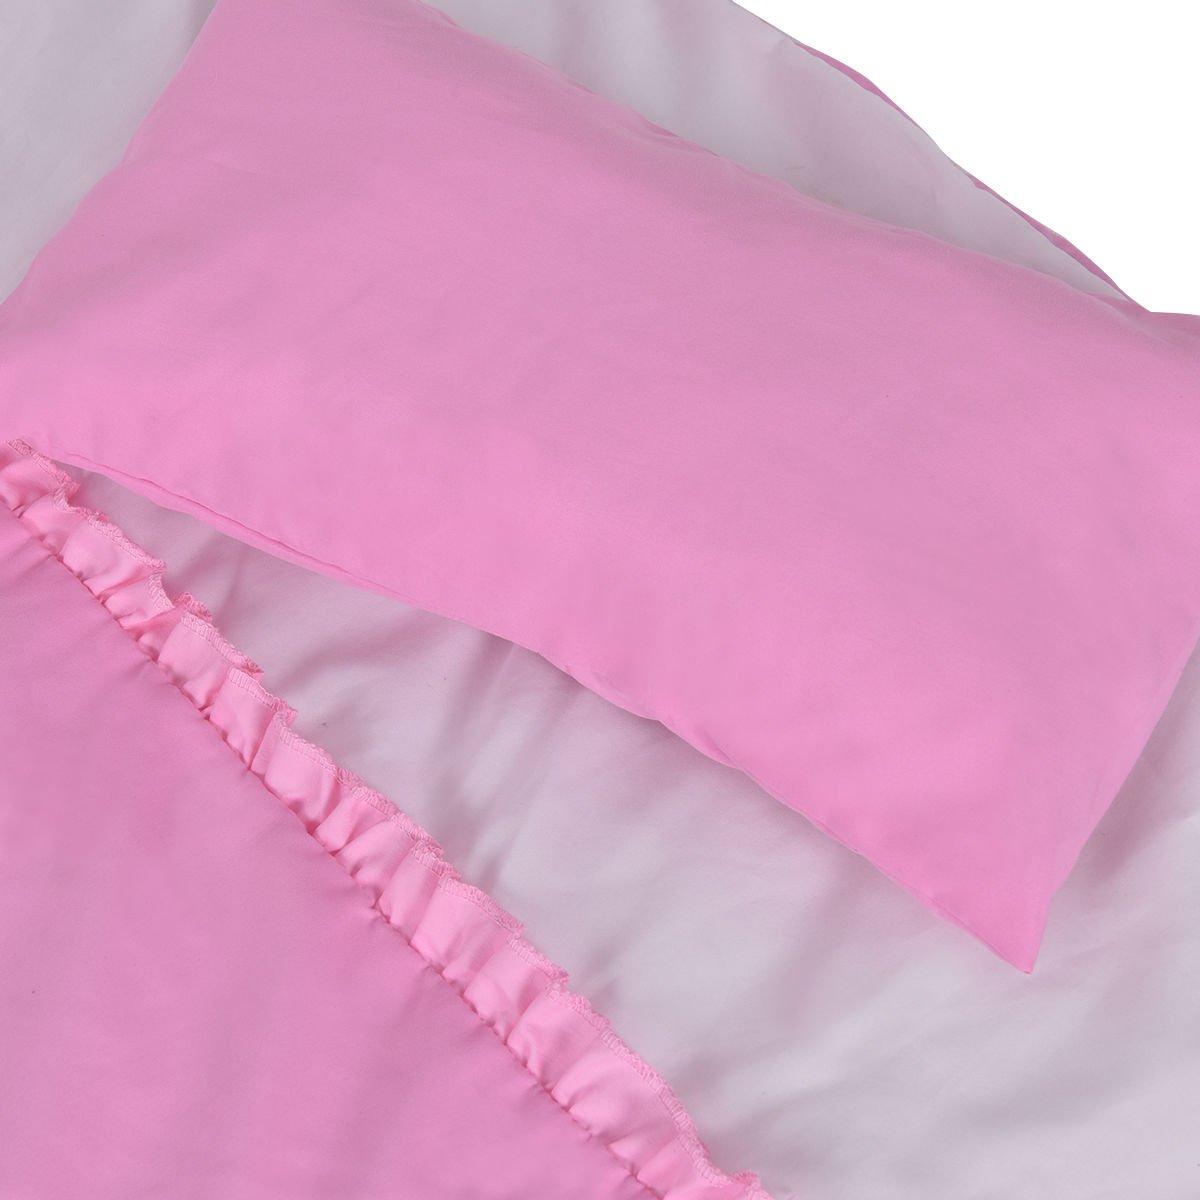 Wood Baby Cradle Rocking Crib Newborn Bassinet Bed Sleeper Portable Nursery Pink by onestops8 (Image #5)